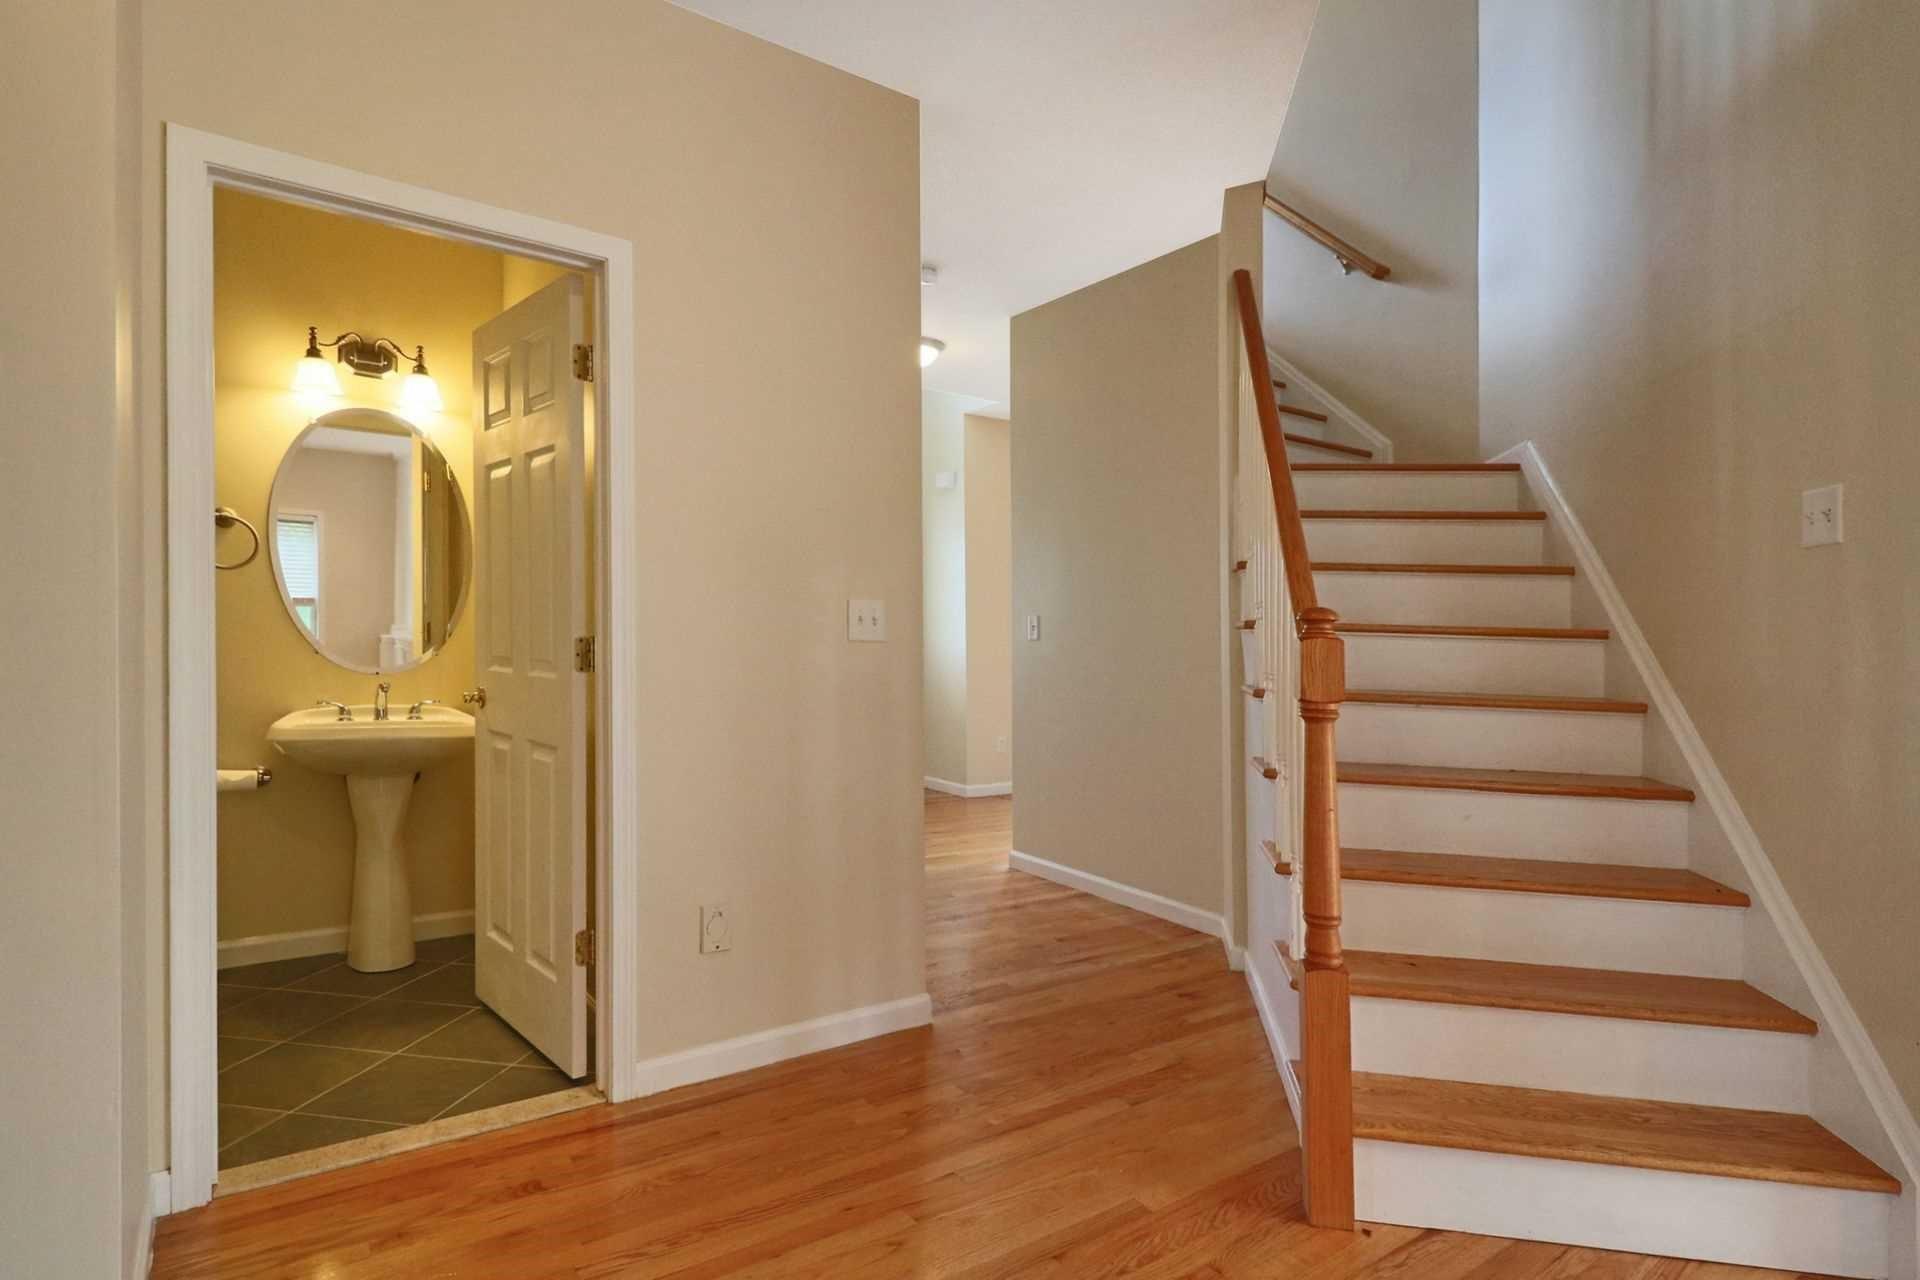 Additional photo for property listing at 4 SUMMIT Drive 4 SUMMIT Drive Marlboro, New York 12542 United States